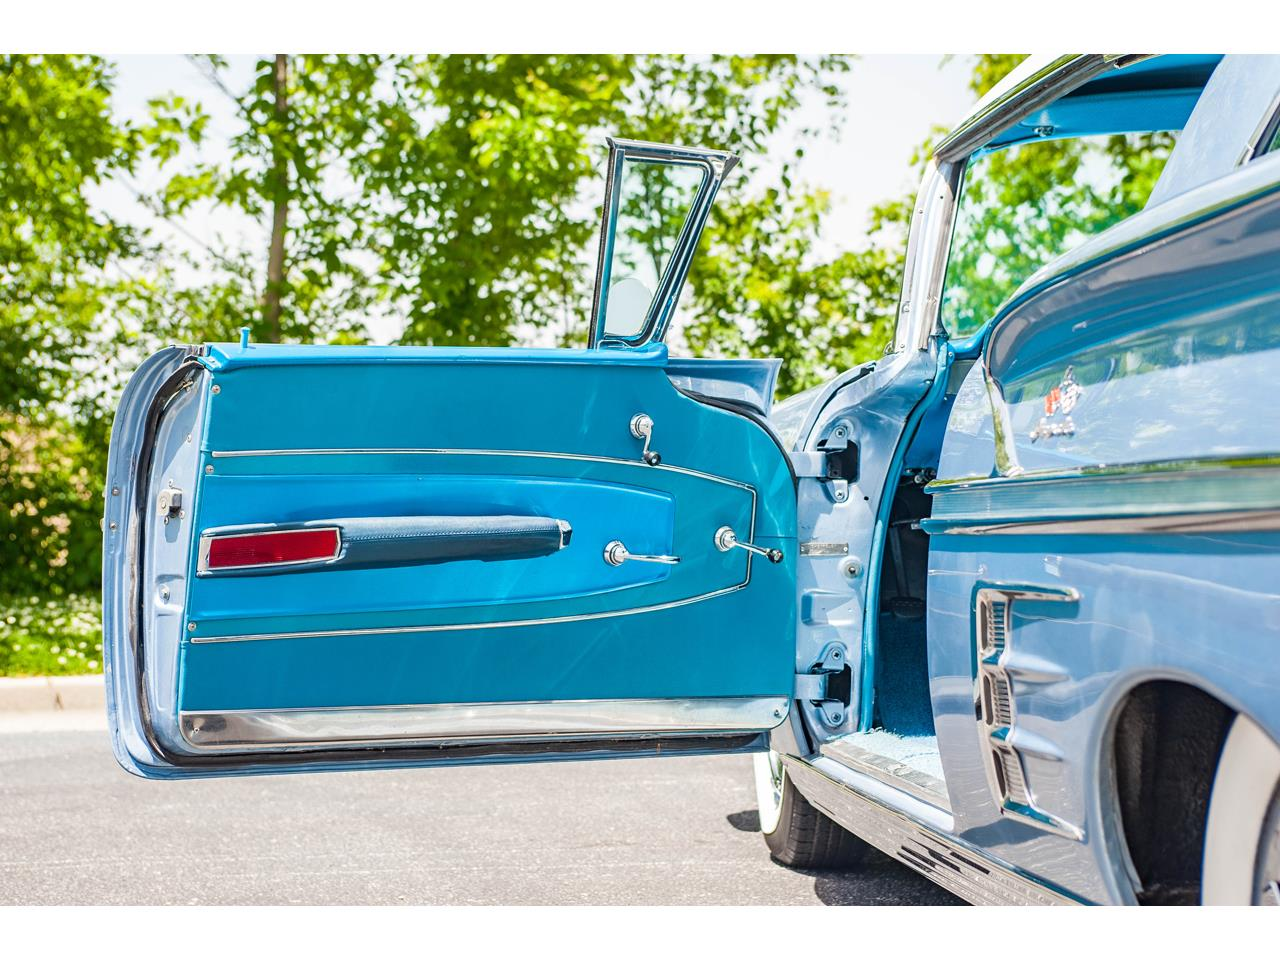 Large Picture of 1958 Chevrolet Impala located in O'Fallon Illinois - $62,000.00 - QB9Q